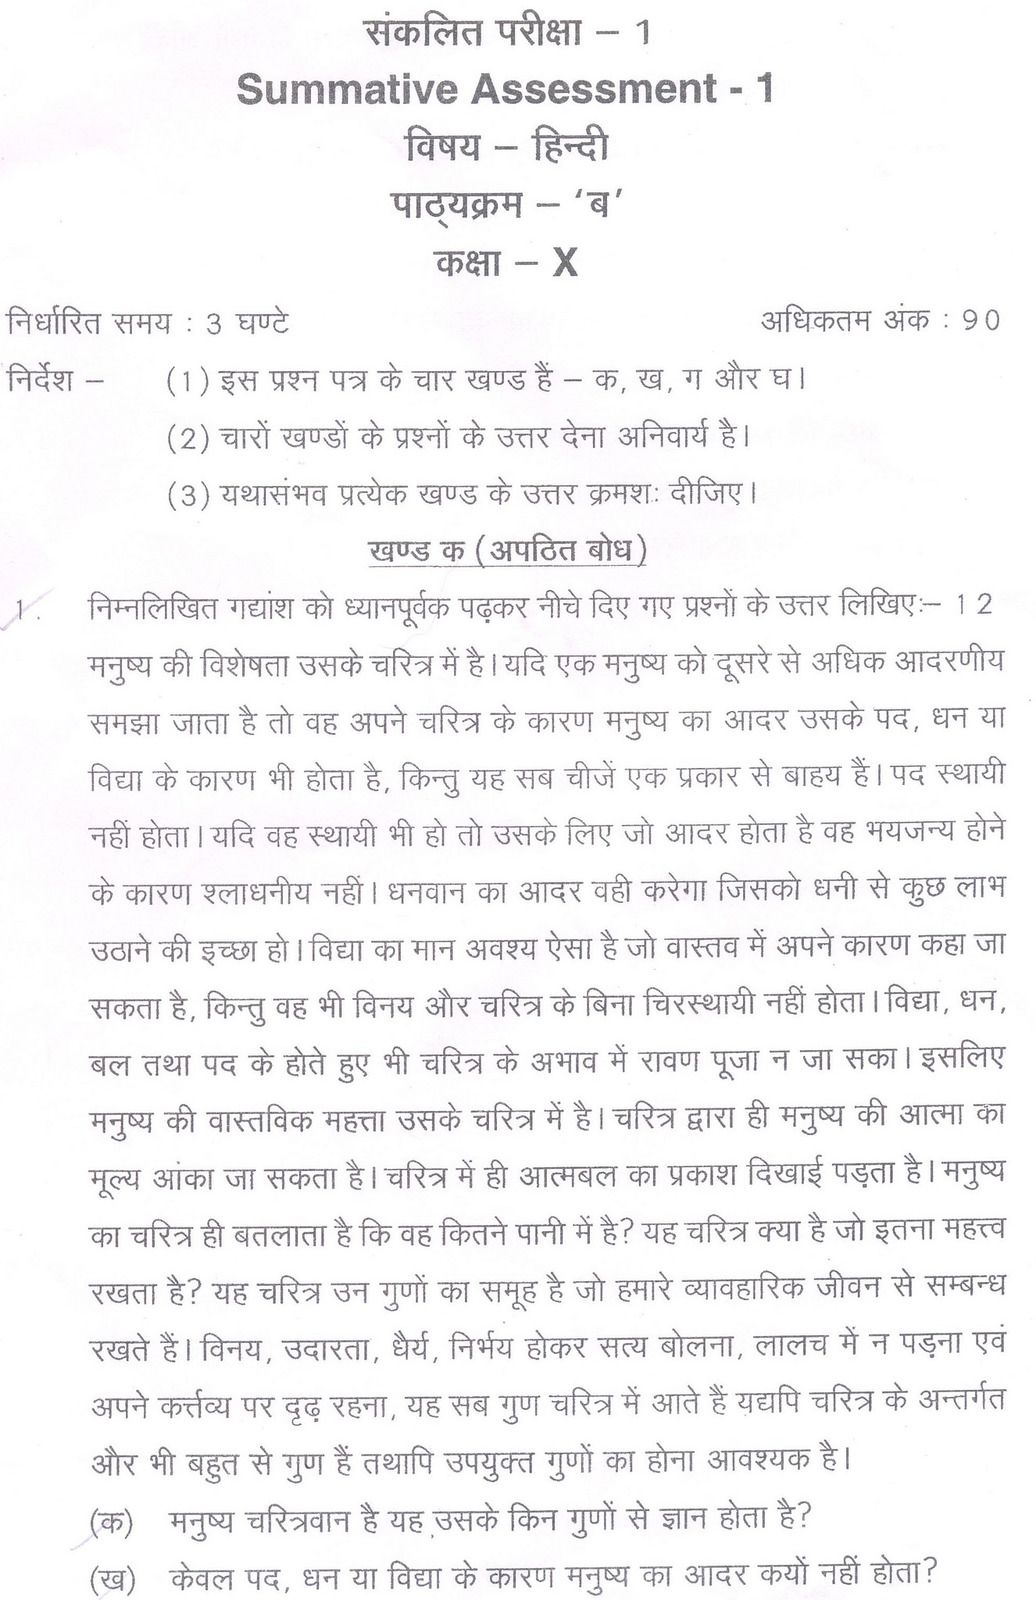 Cbse 2014 2015 class 10 sa1 question papers hindi kodaikanal cbse 2014 2015 class 10 sa1 question papers hindi malvernweather Images